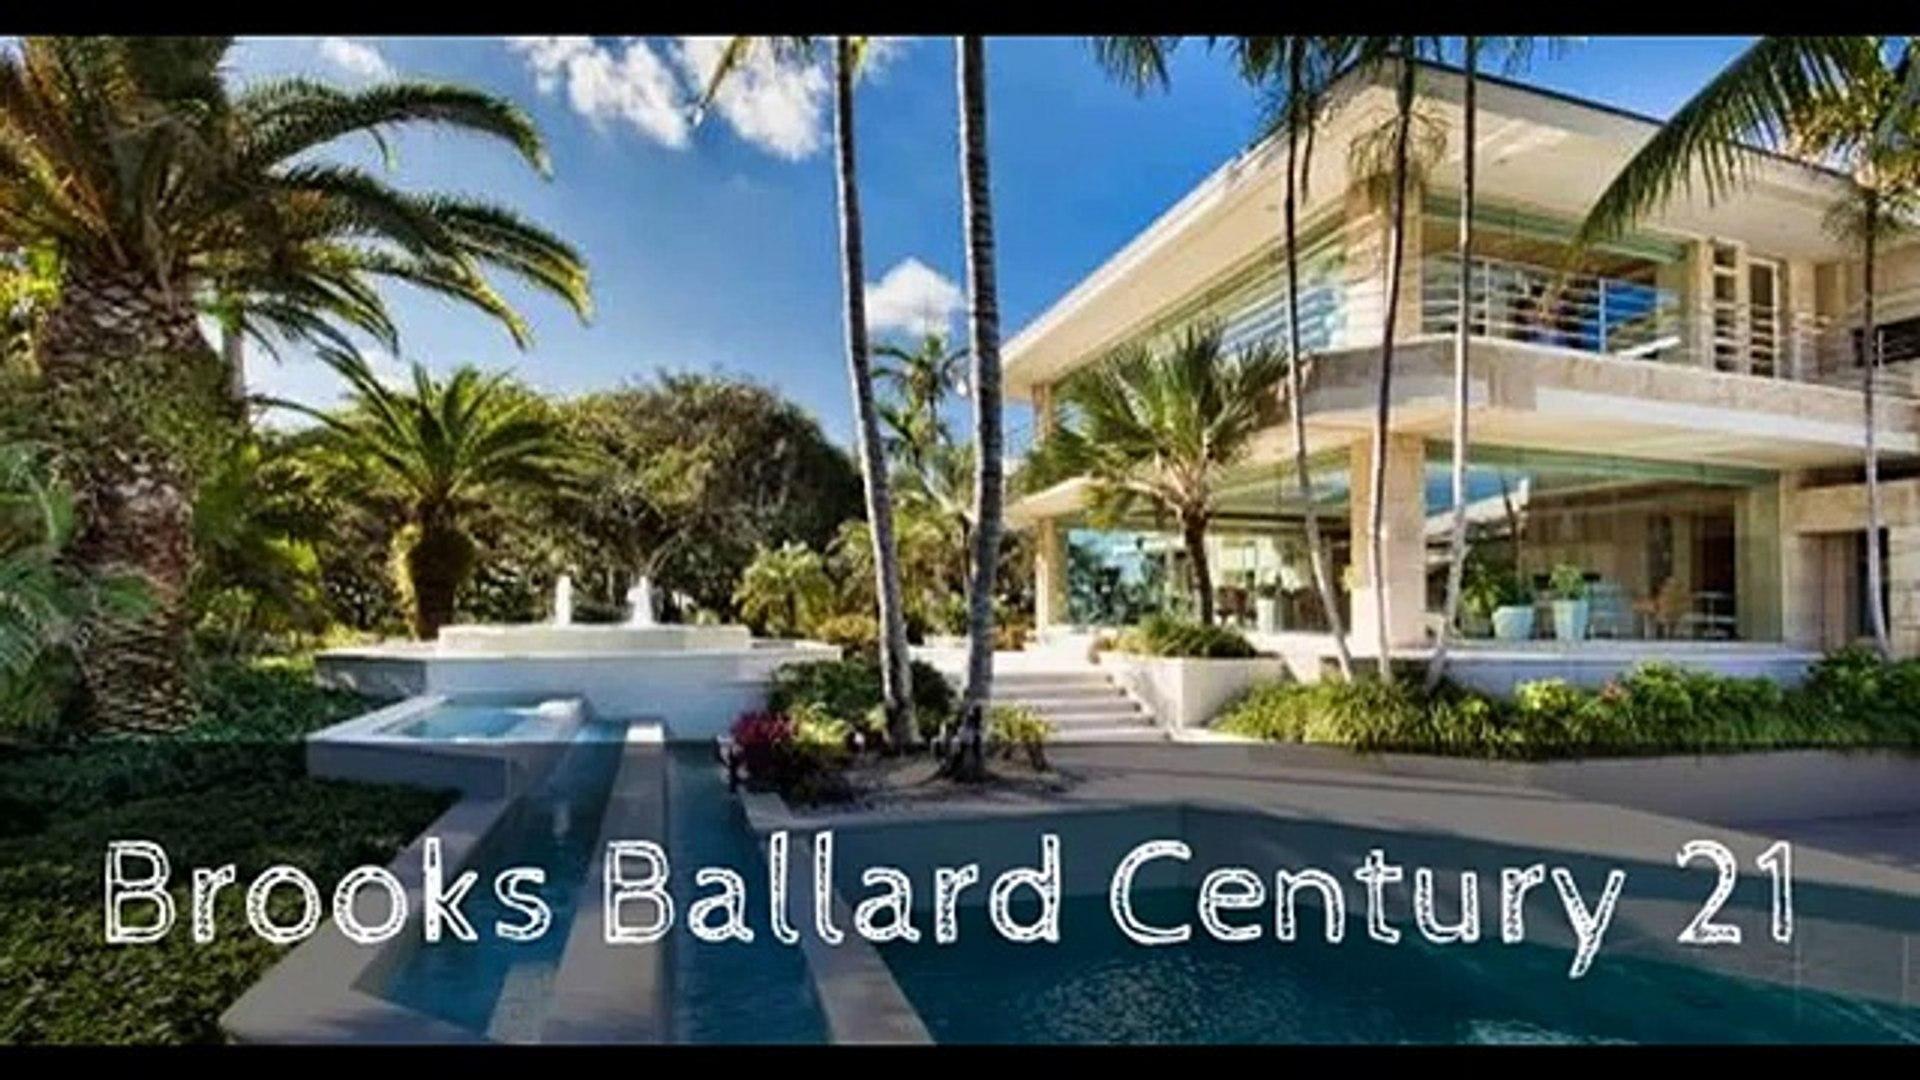 Brooks Ballard Real Estate - Houston Texas - Brooks Ballard Real Estate - Brooks Ballard Century 21